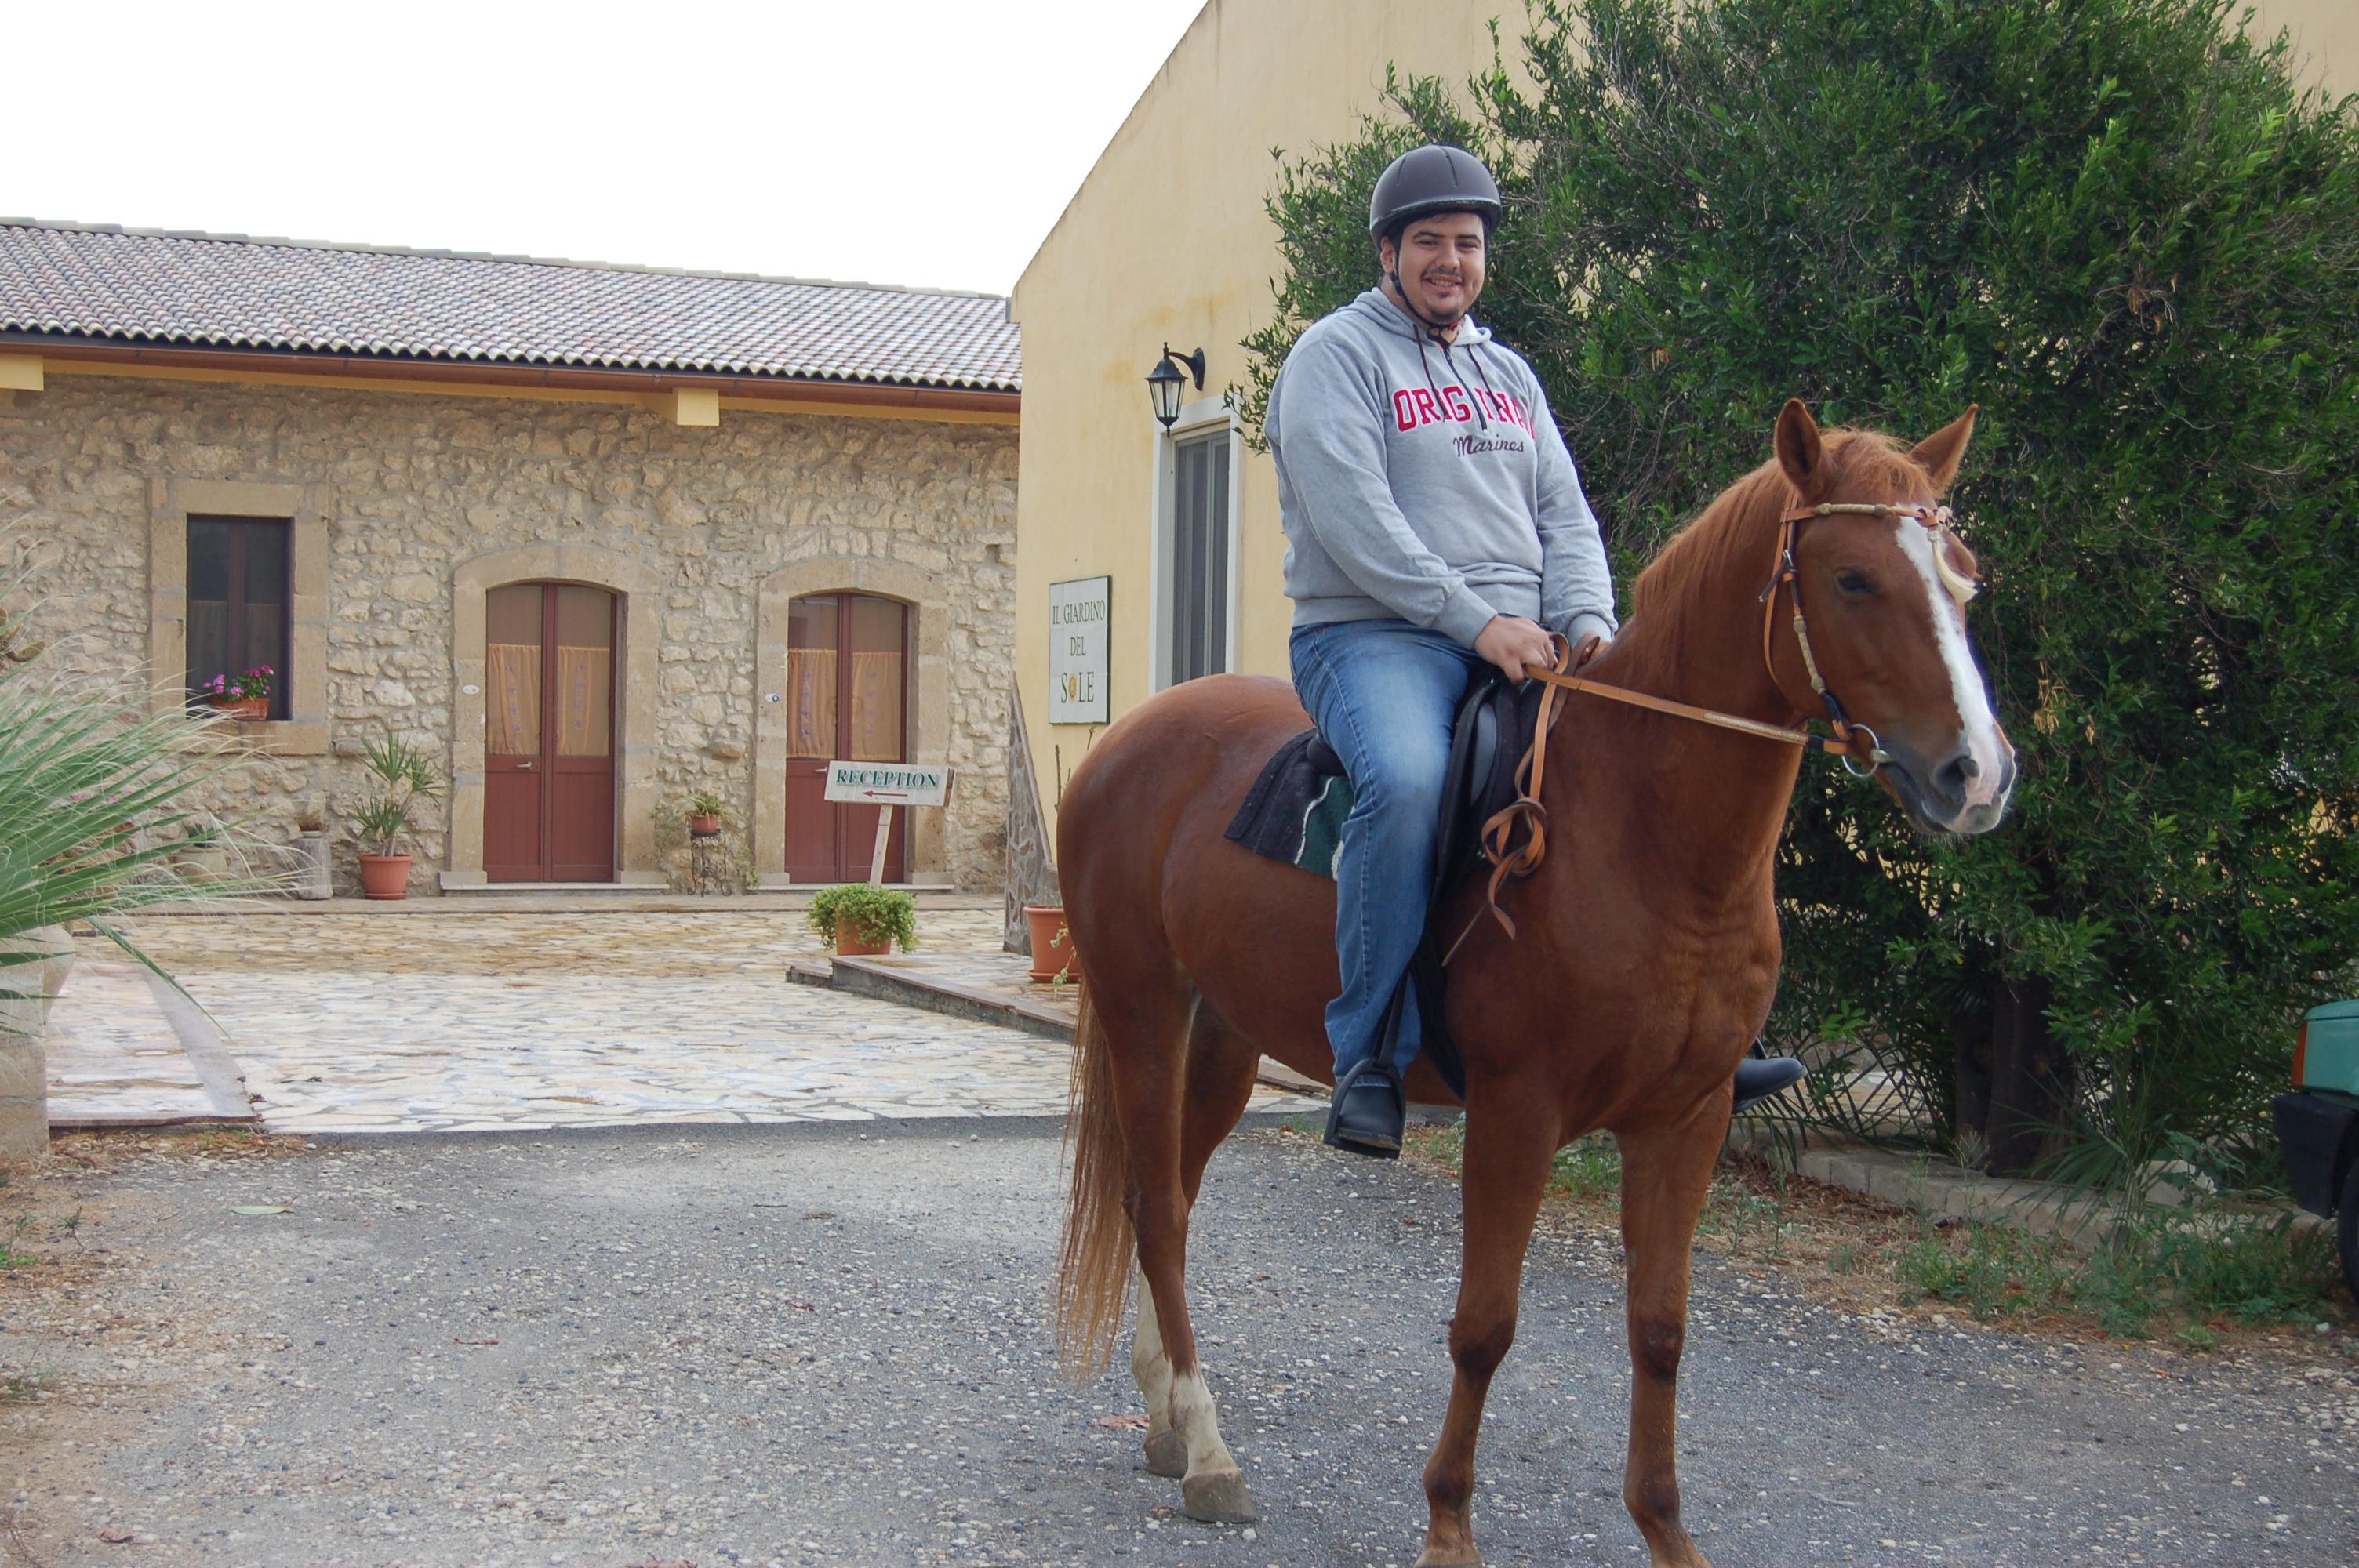 Agriturismo a cavallo